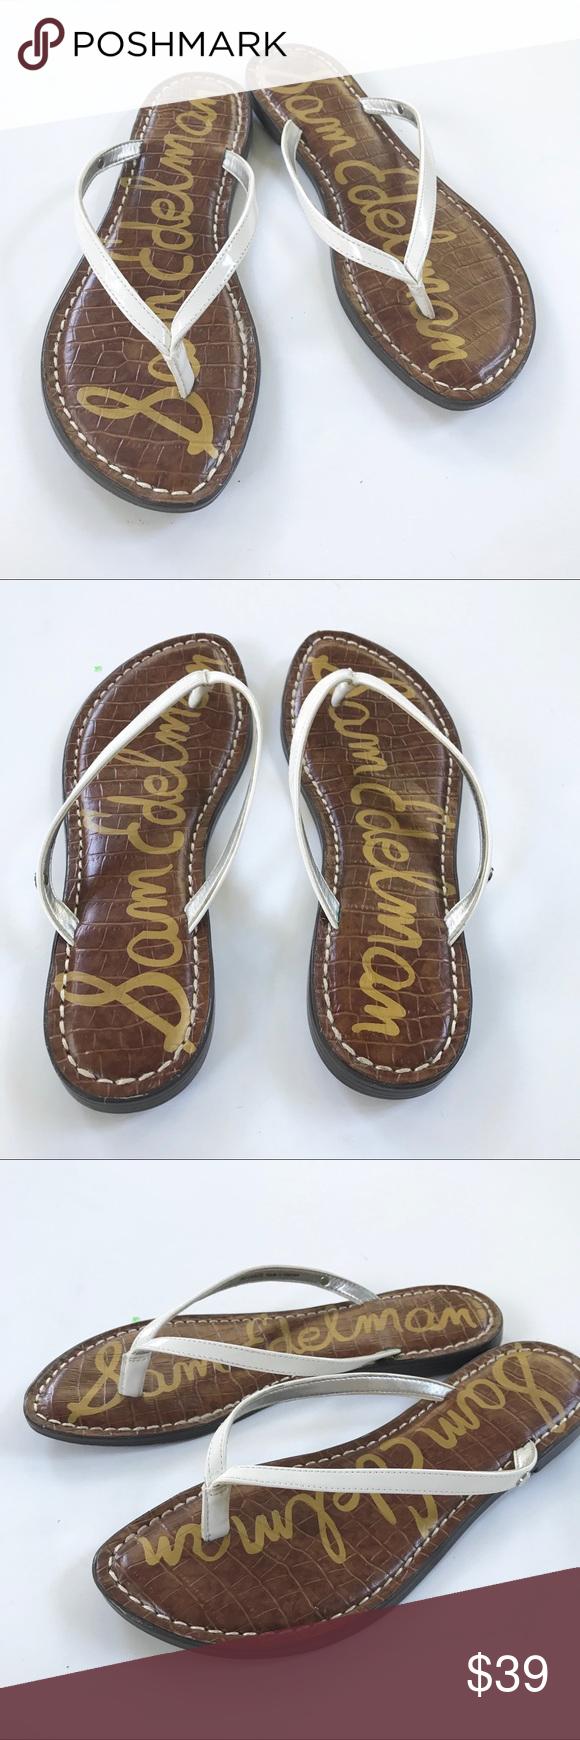 7068ee44cf53c3 Sam Edelman Gracie Thong Flip Flip Sandals 8 Sam Edelman classic sandal in  a neutral white